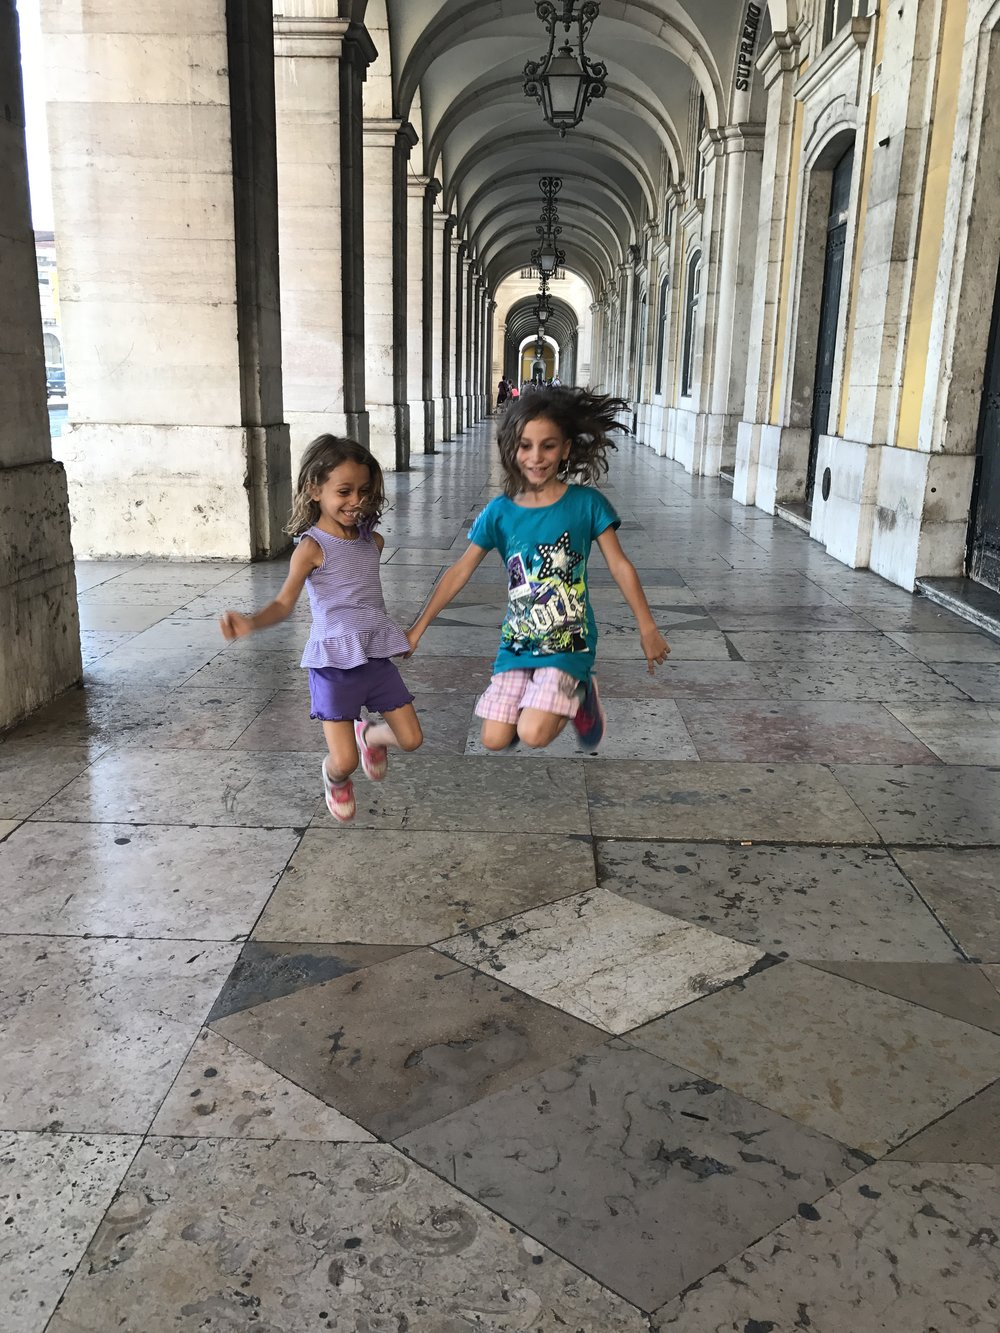 Sisters enjoying life!